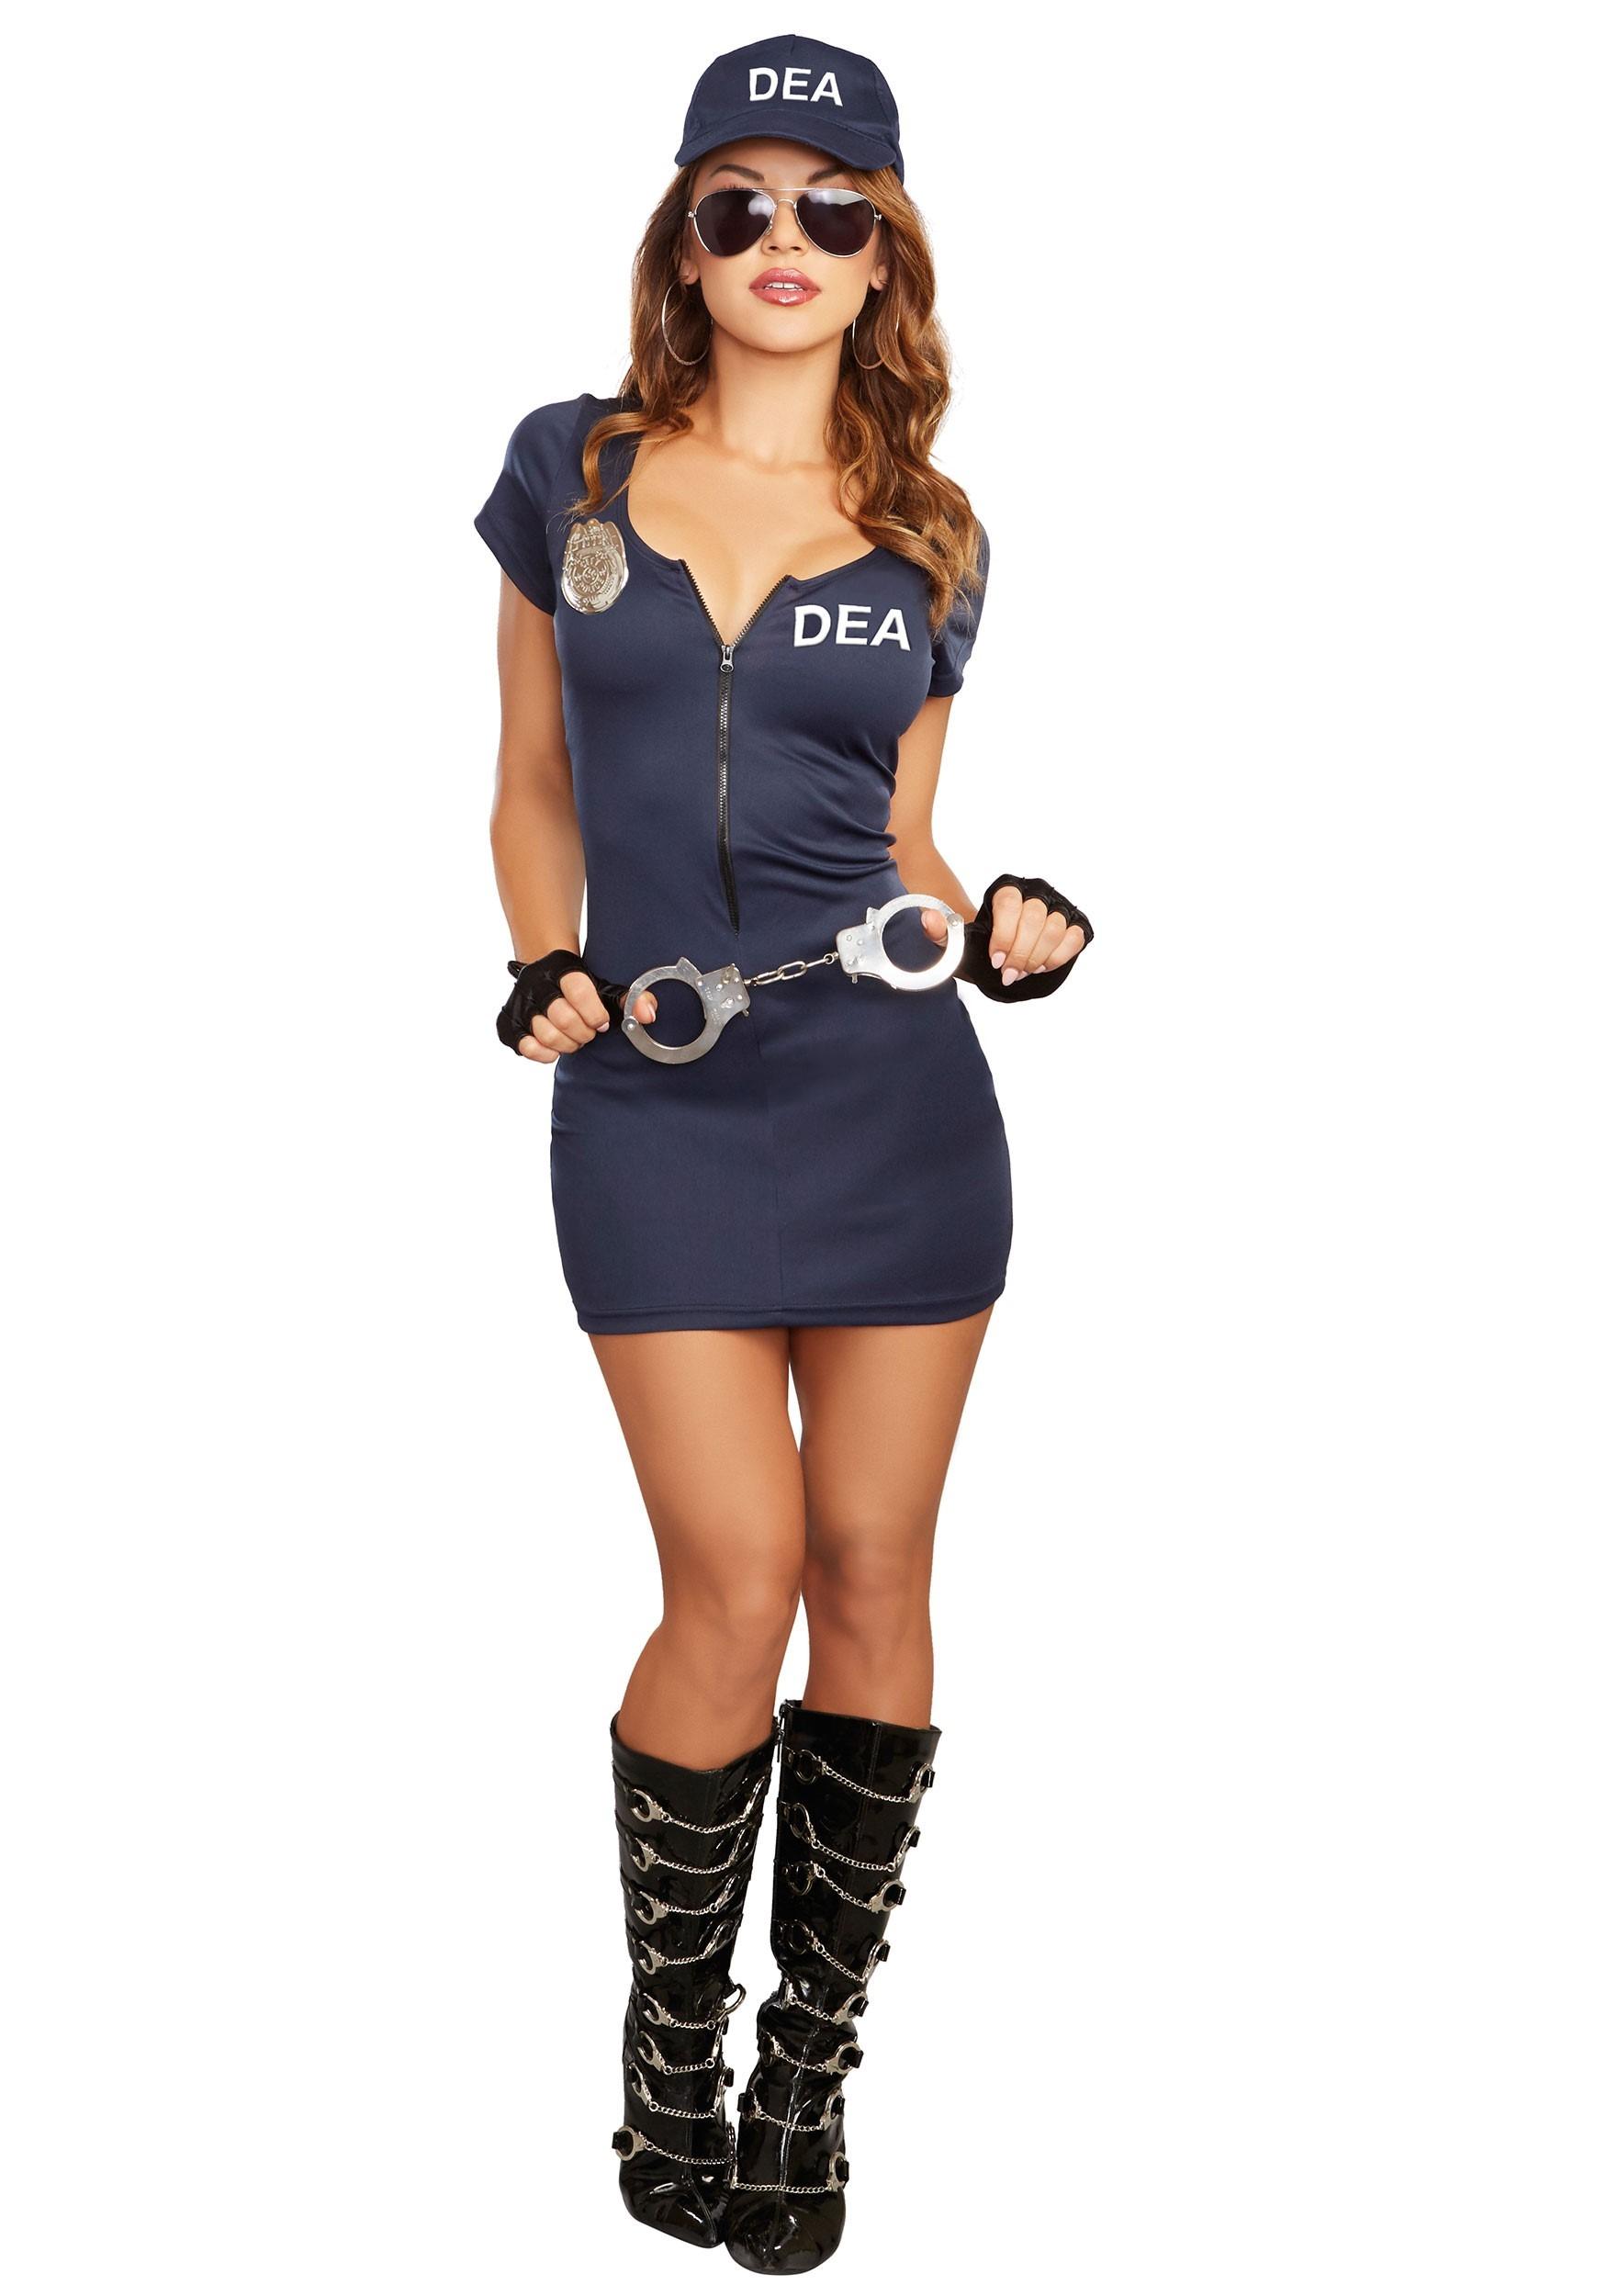 Halloween Costumes 2020 Dea Women's DEA Agent Costume